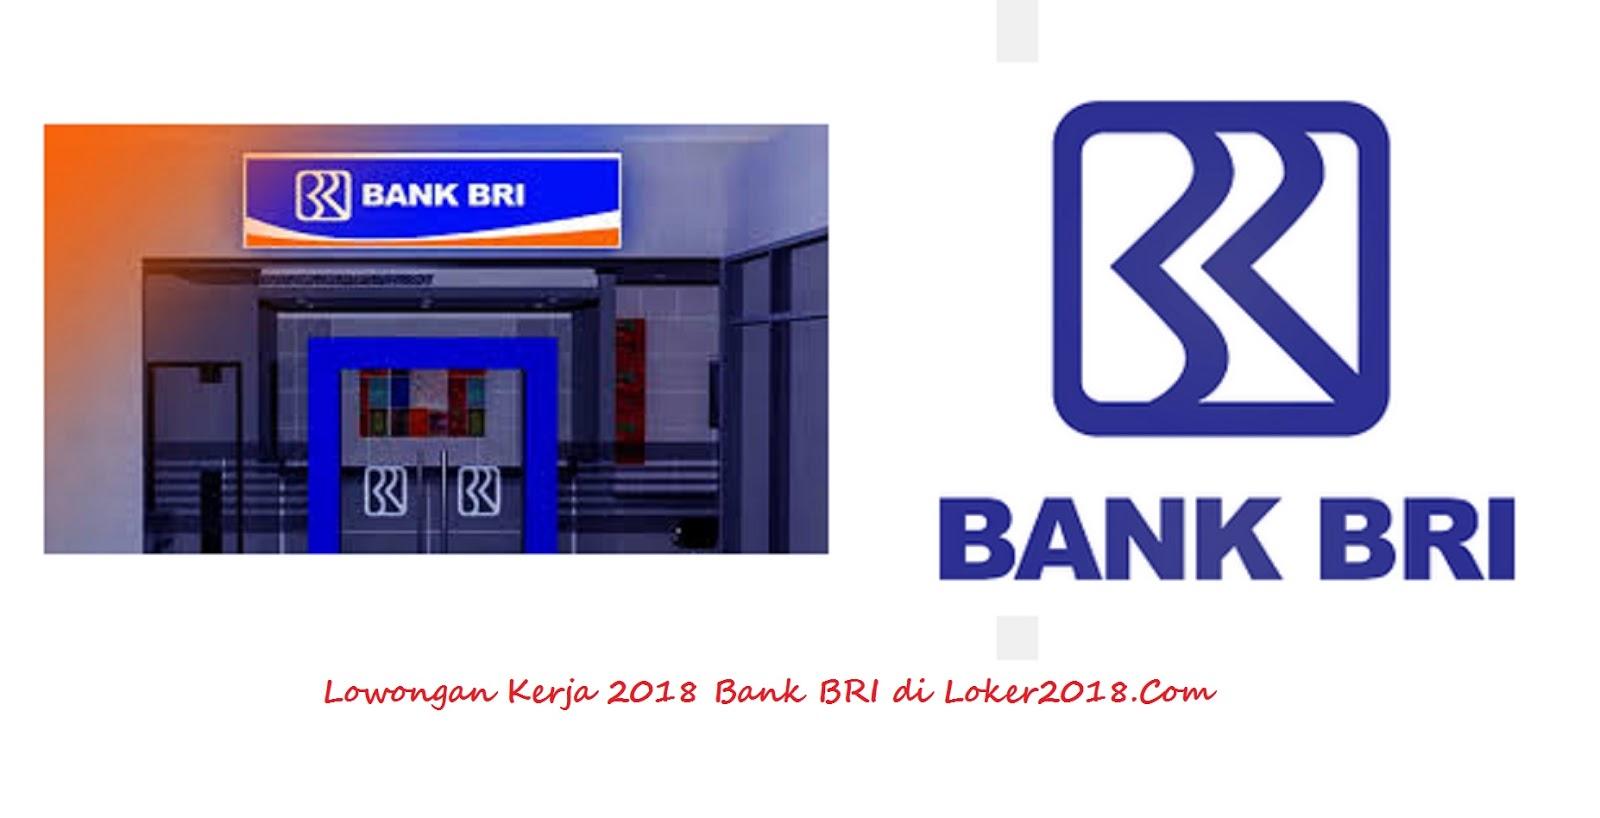 Loker Bank BRI 2018